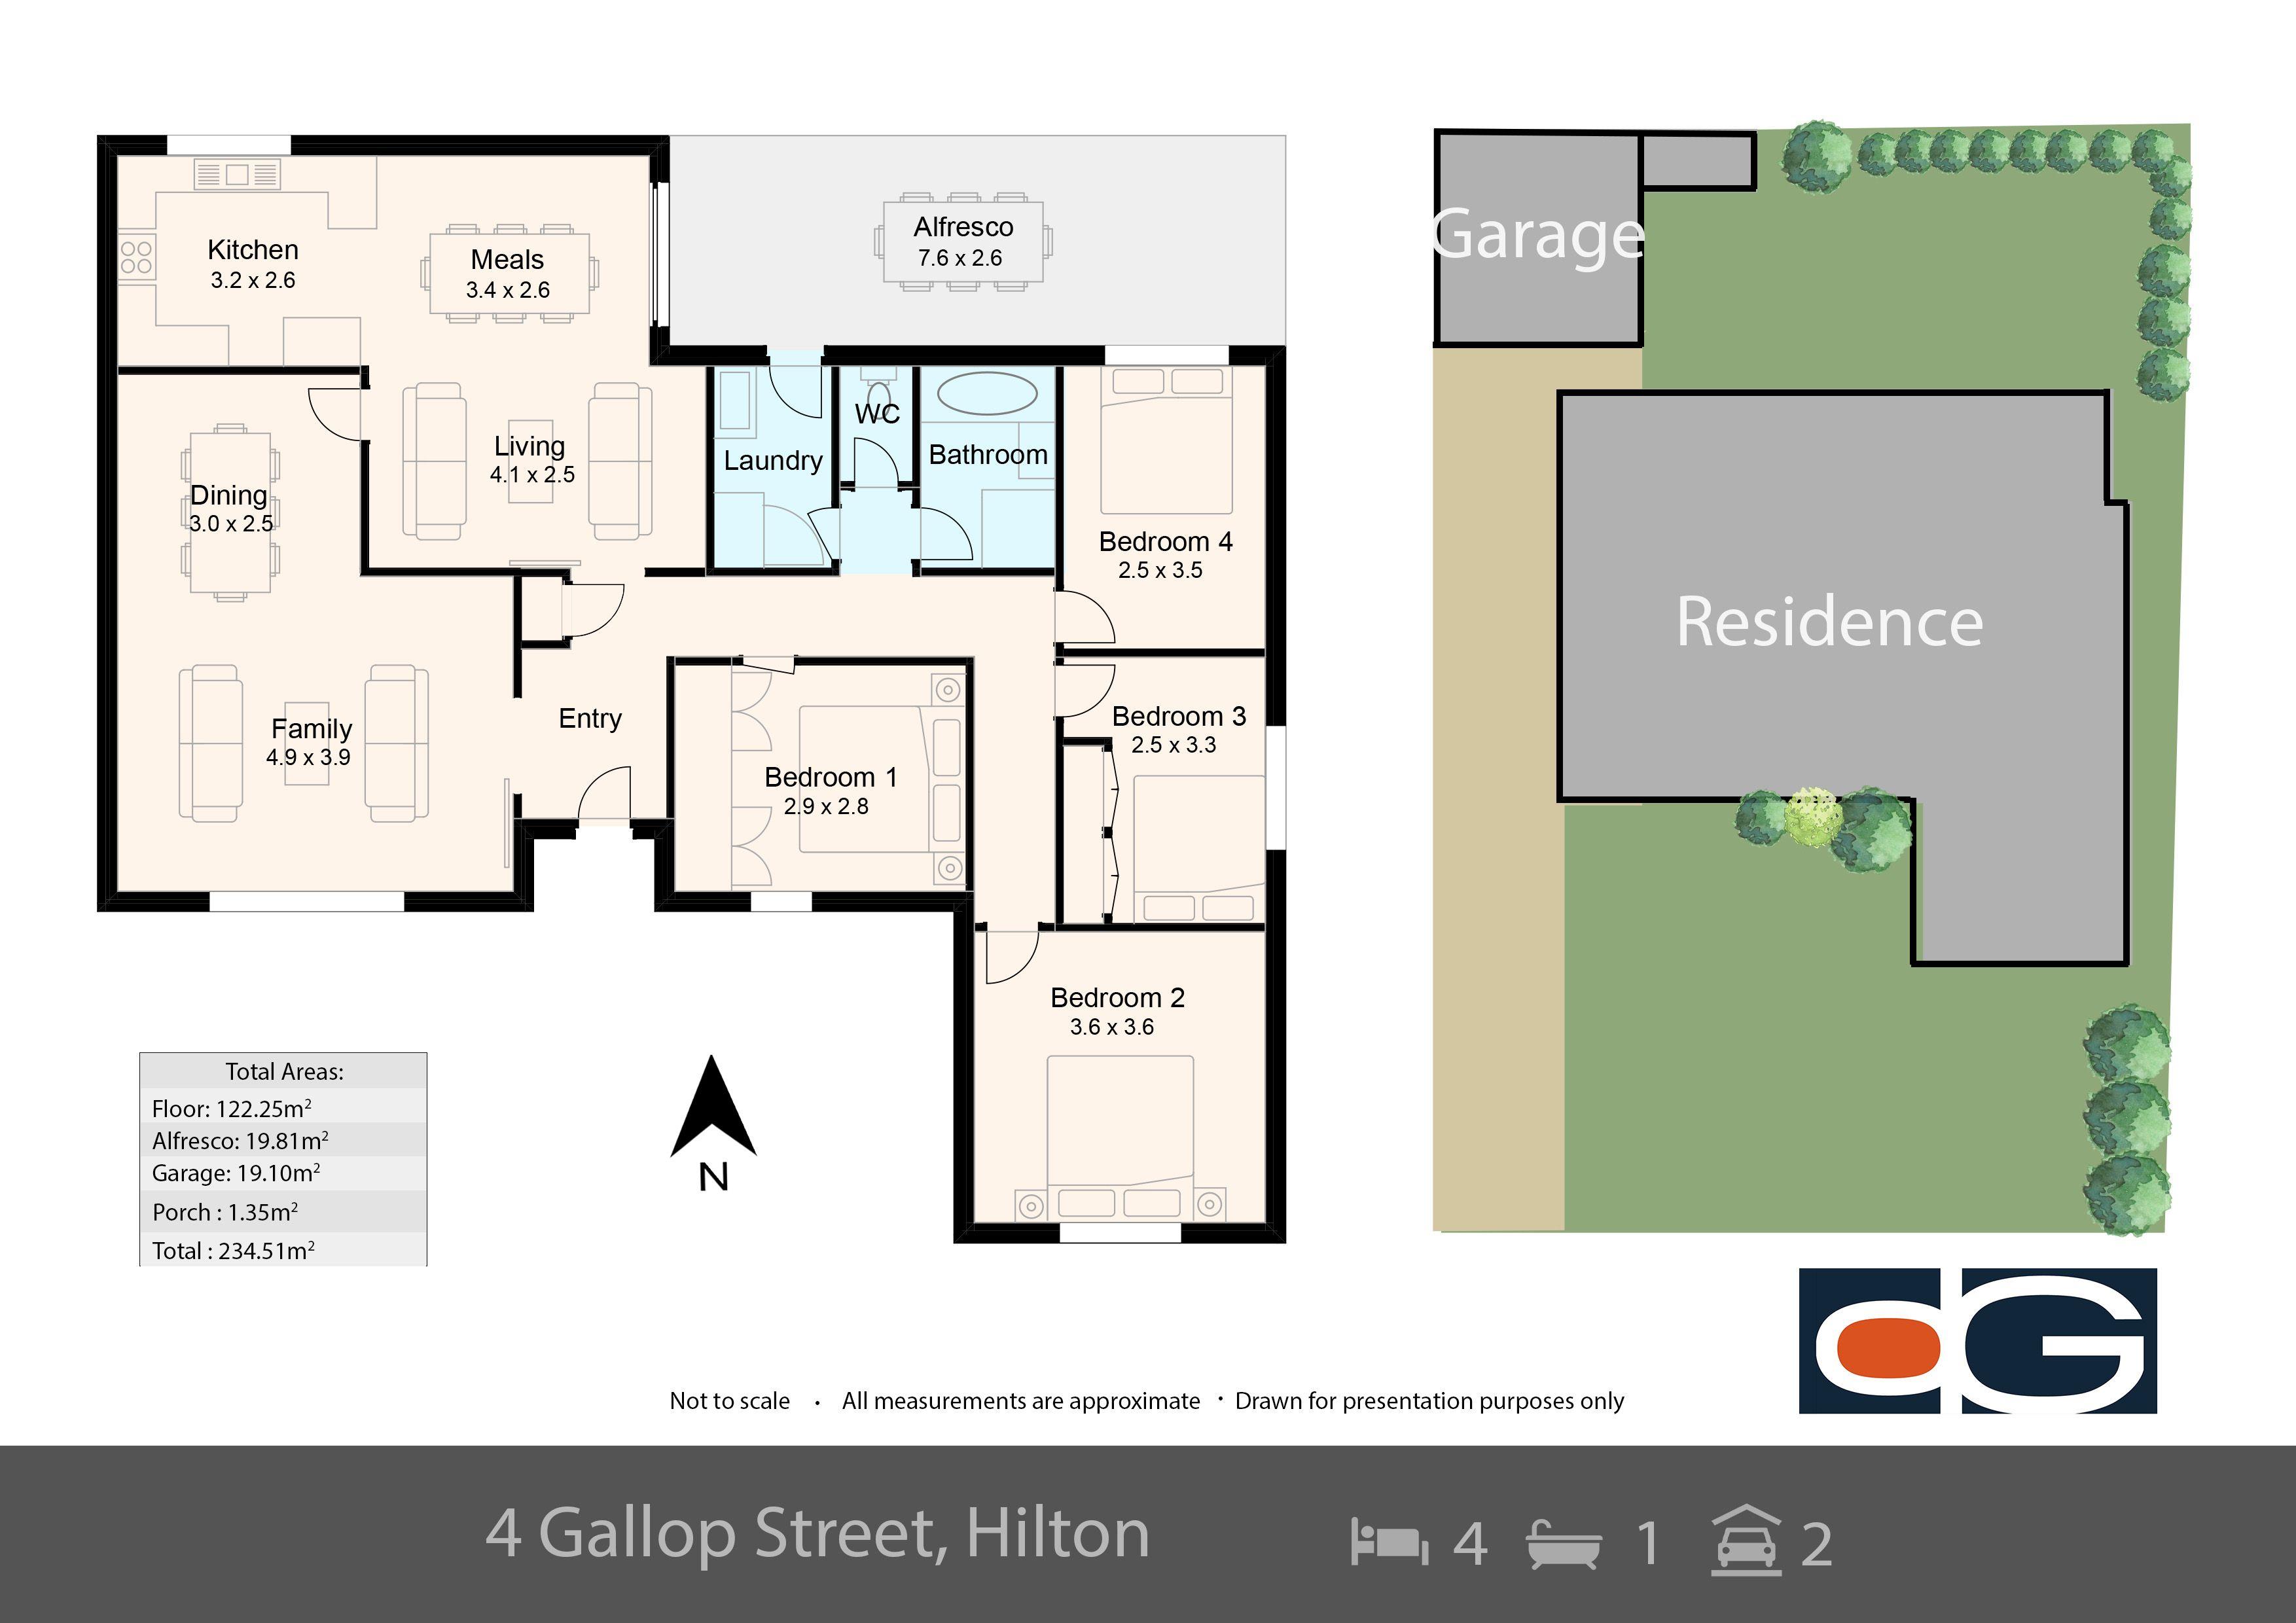 4 Gallop Street, Hilton